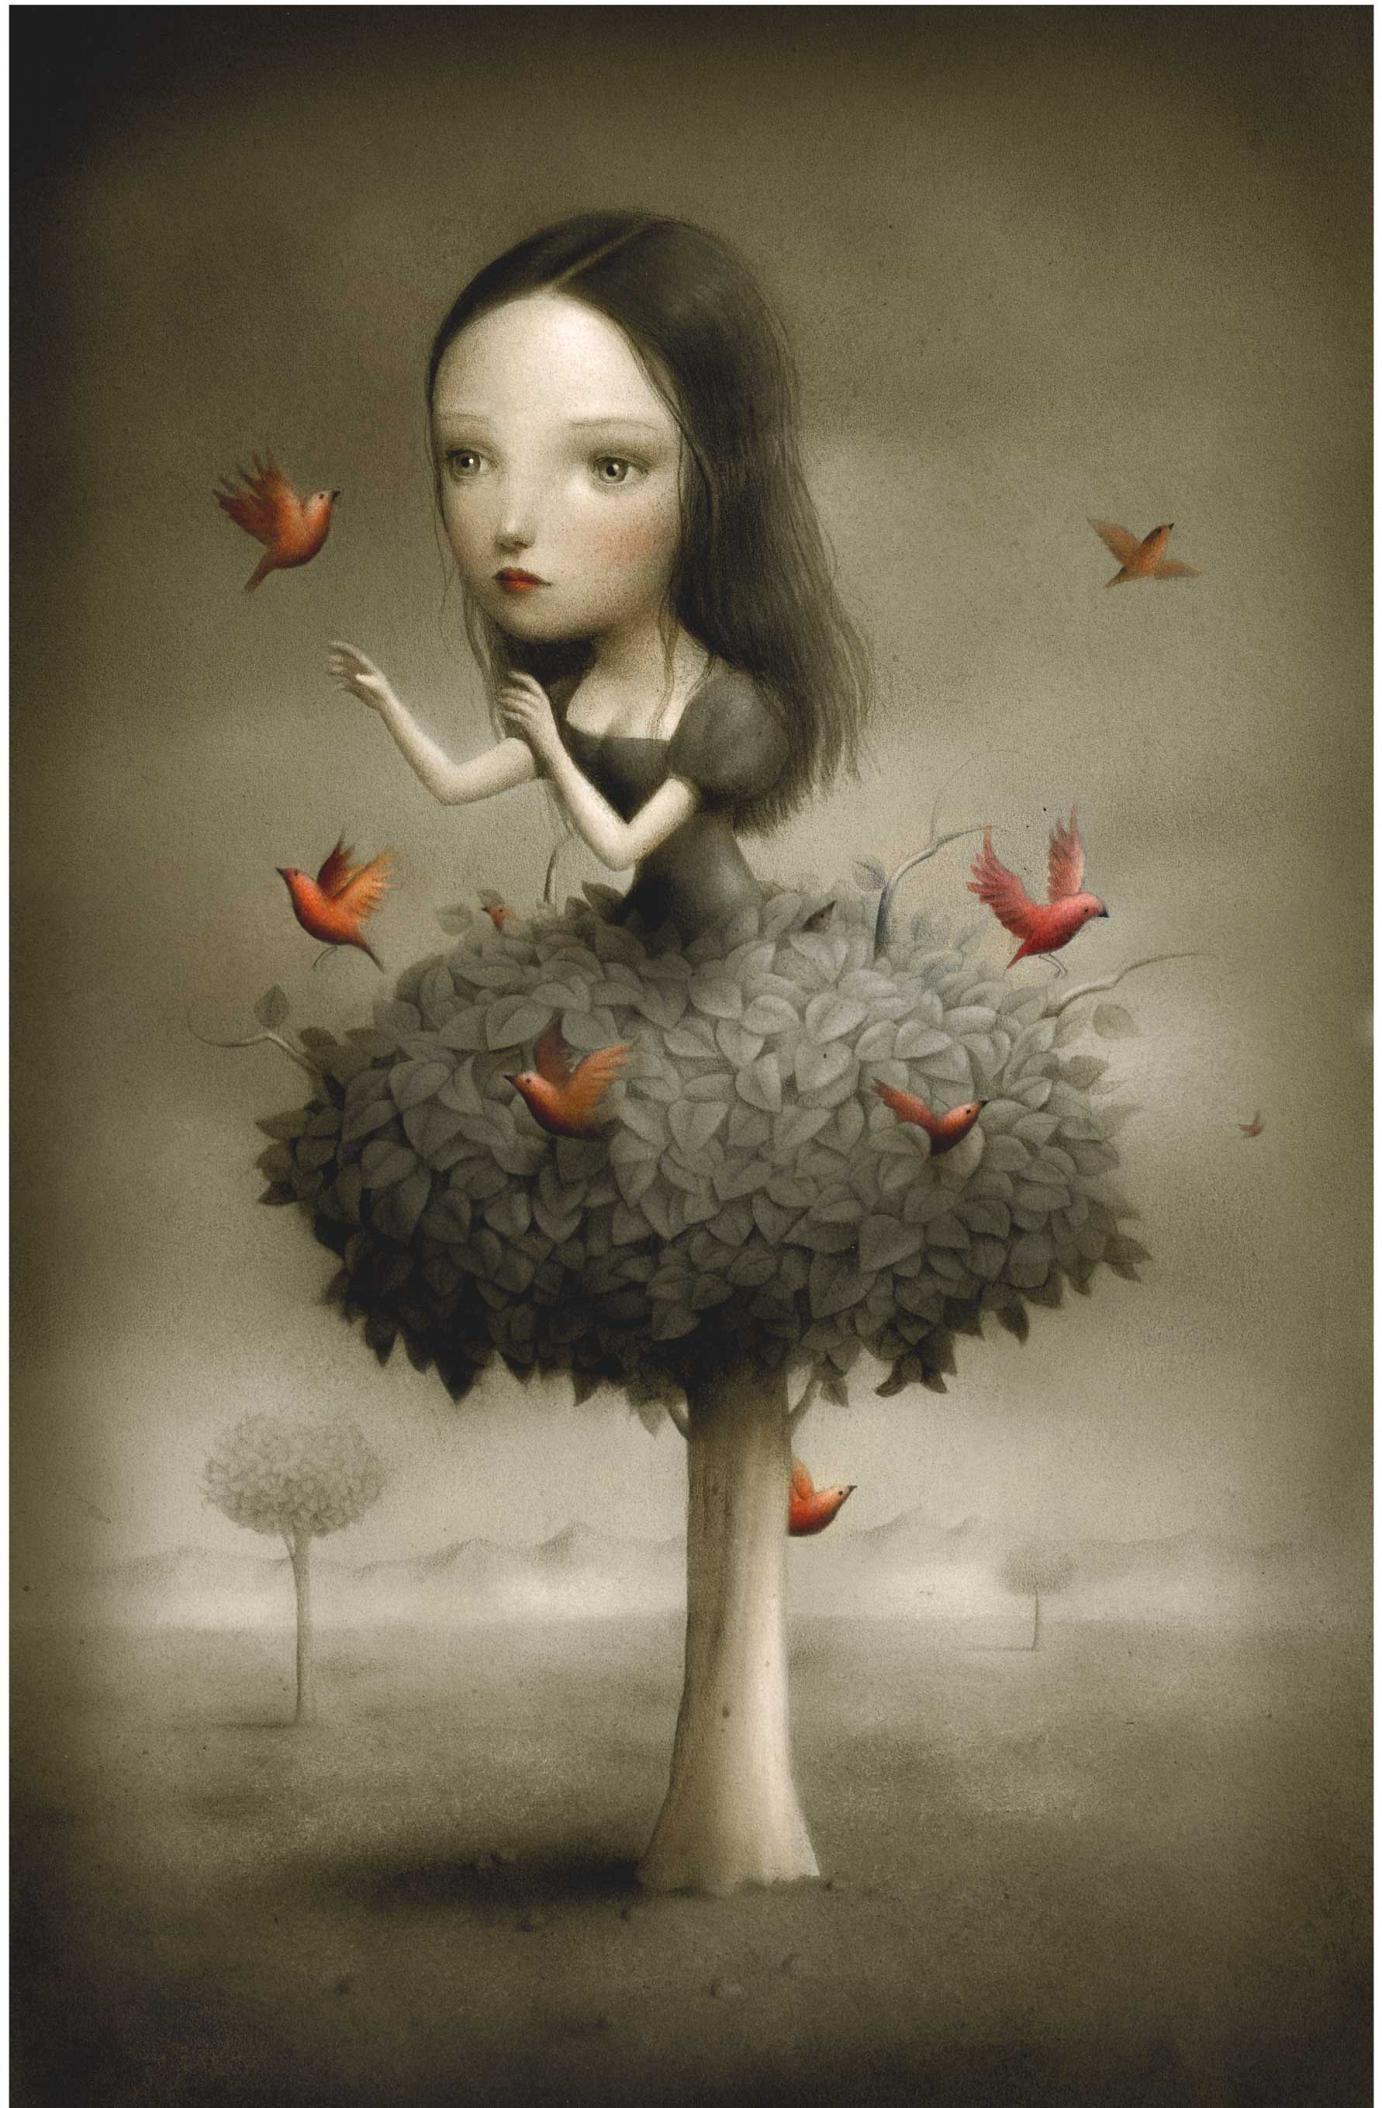 »Tree Girl« 2007 Acryl auf Papier 32 cm x 50 cm von Nicoletta Ceccoli